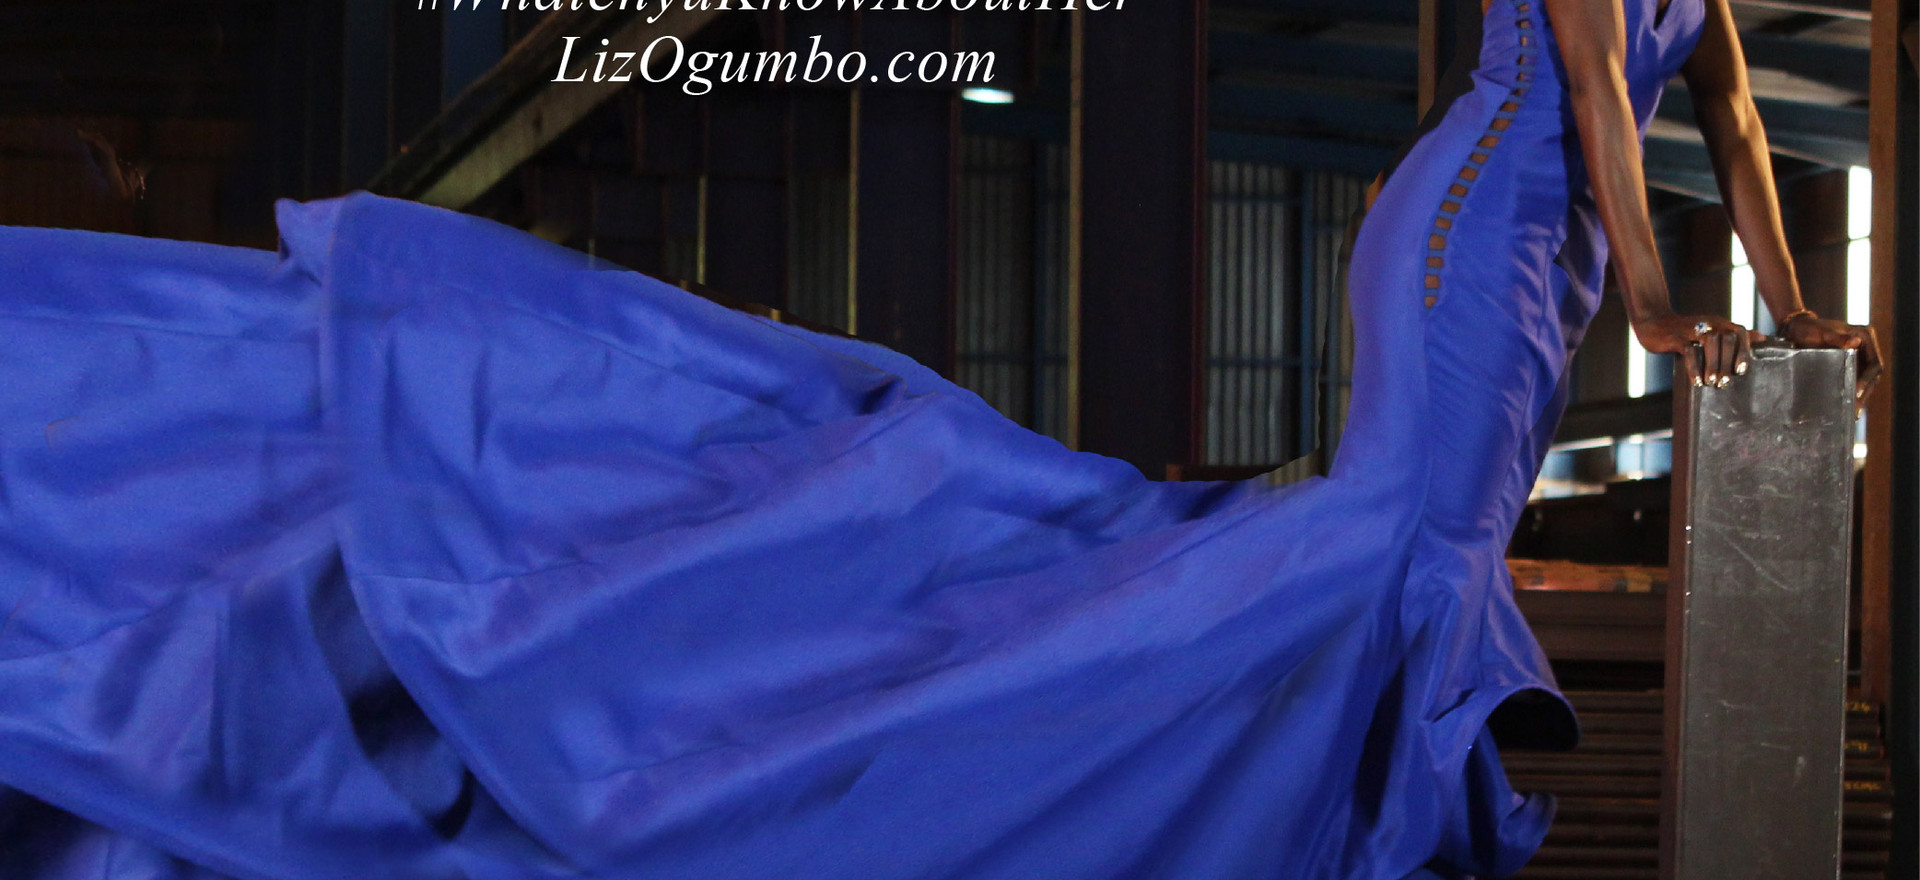 Liz Qoutes- Liz Ogumbo WHATCHYU KNOW ABOUT HER.jpg